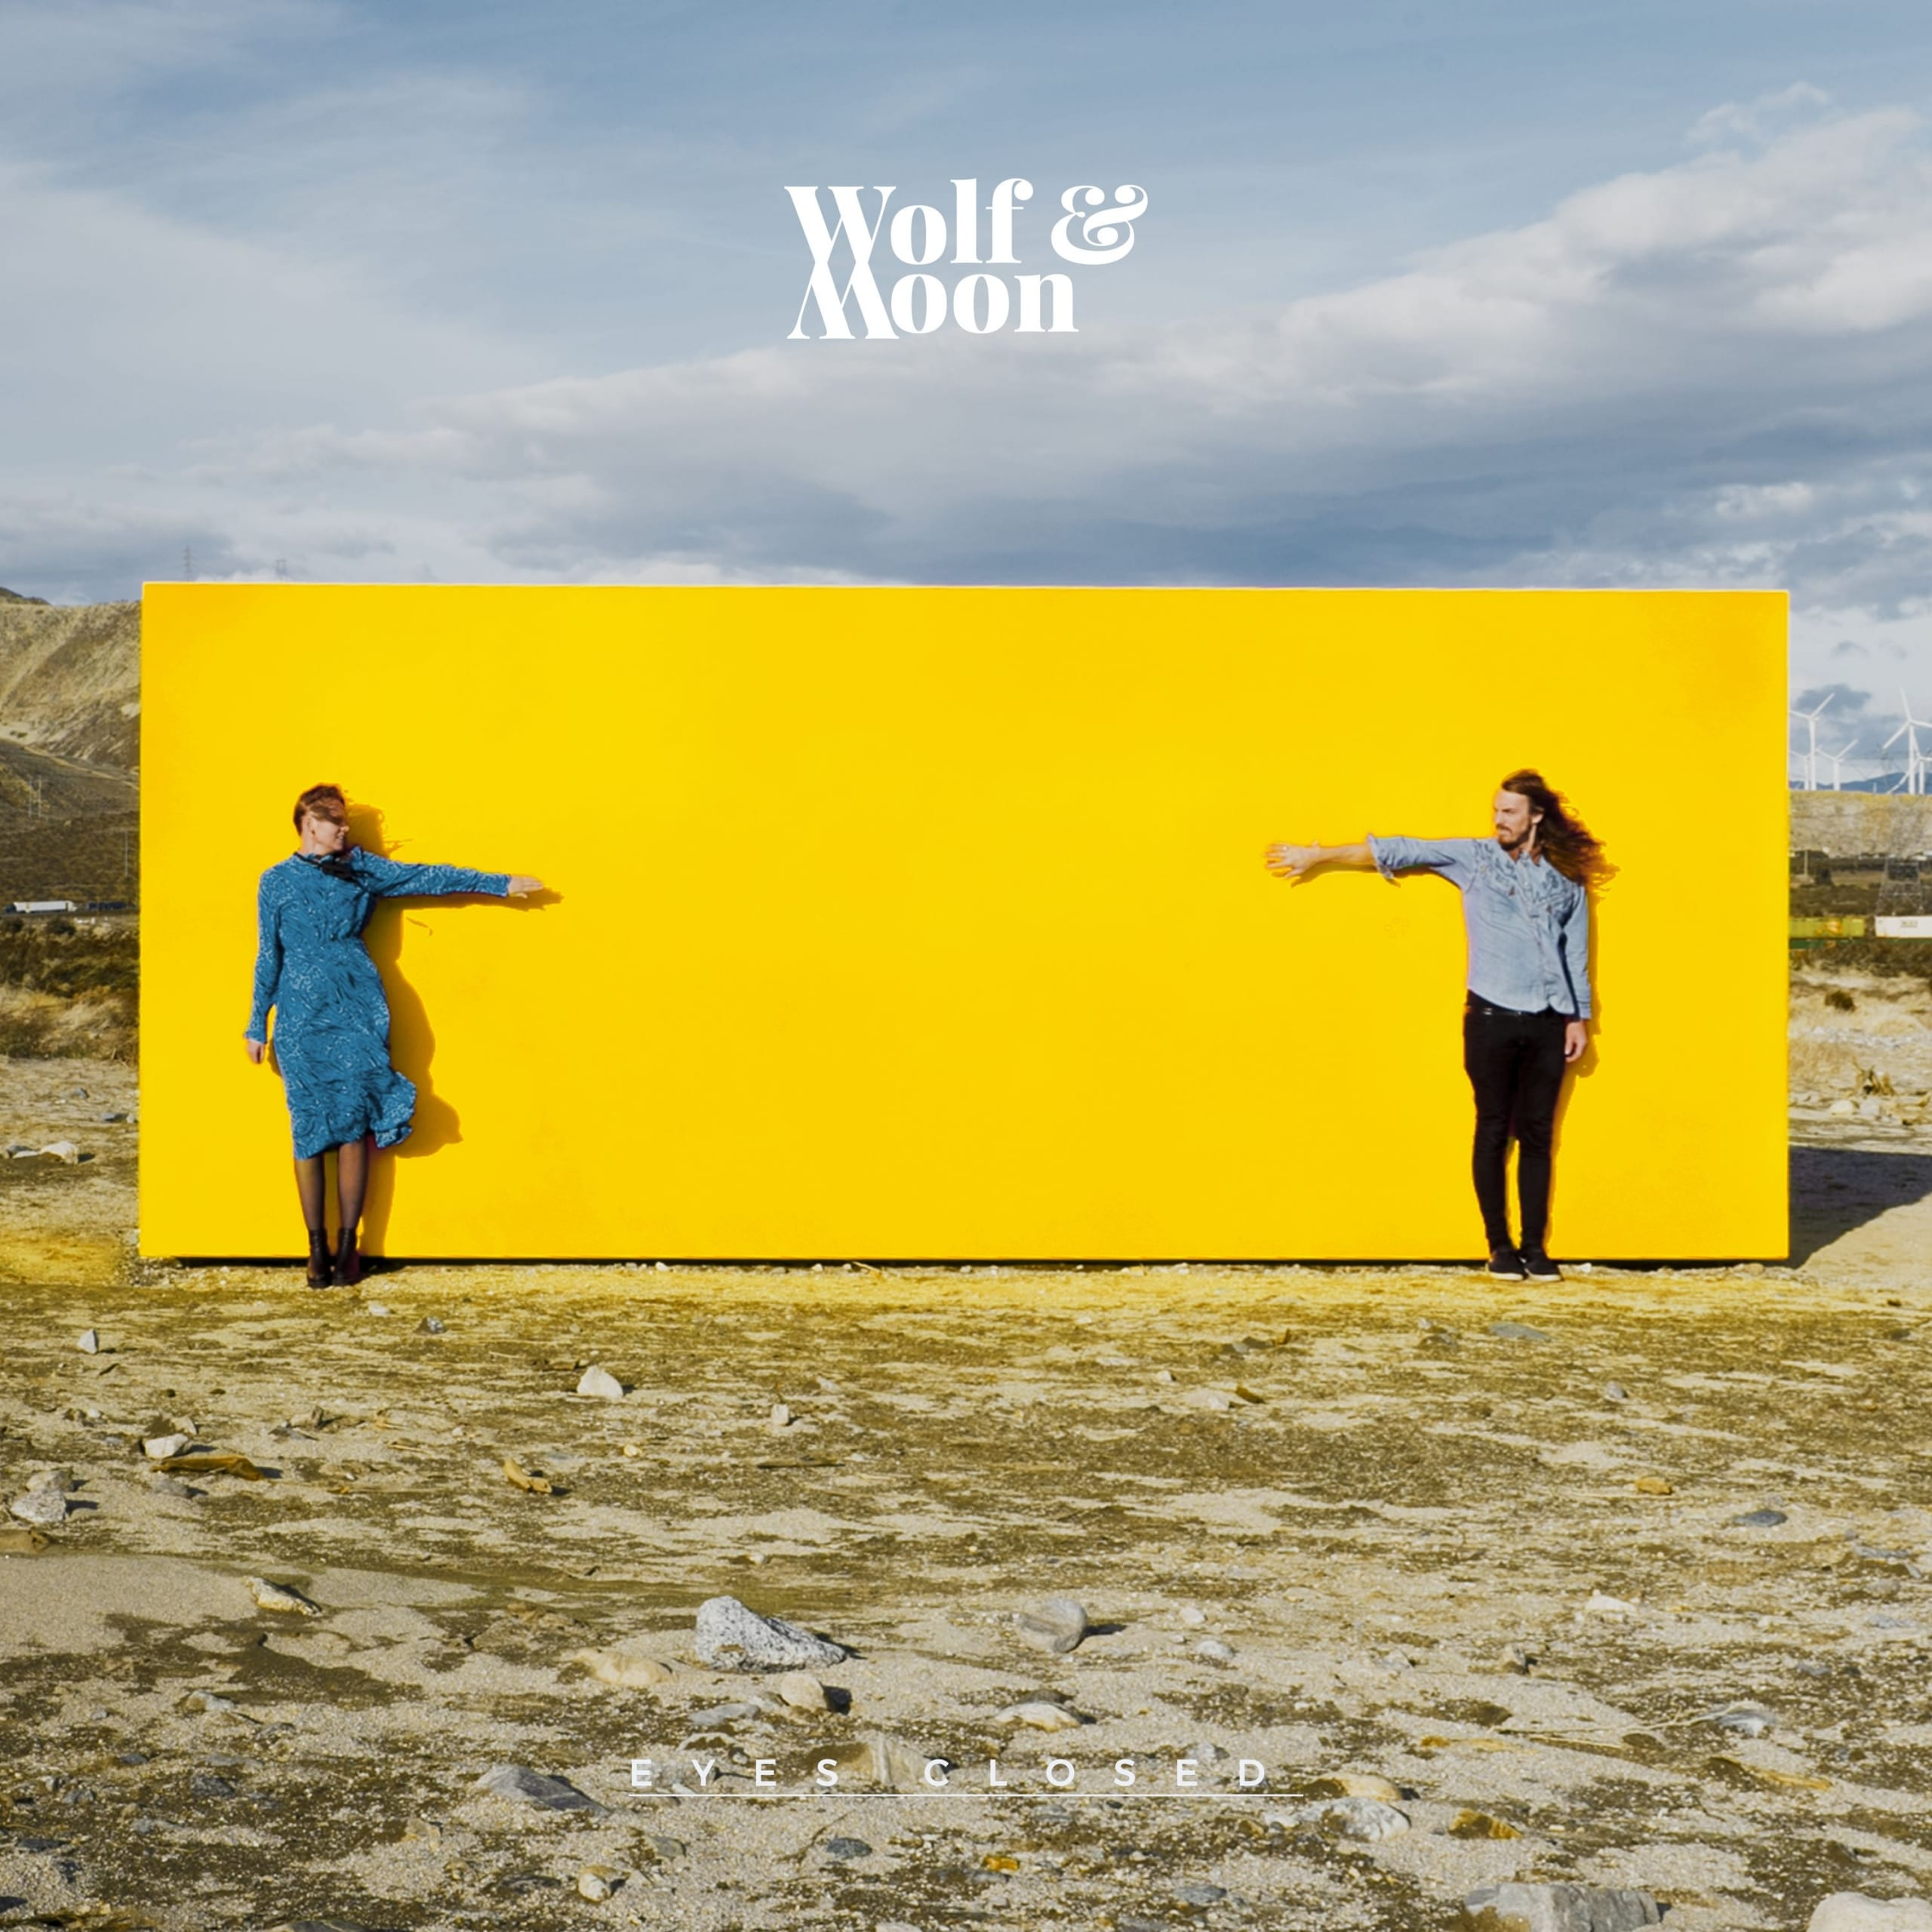 wolf & moon eyes closed artwork